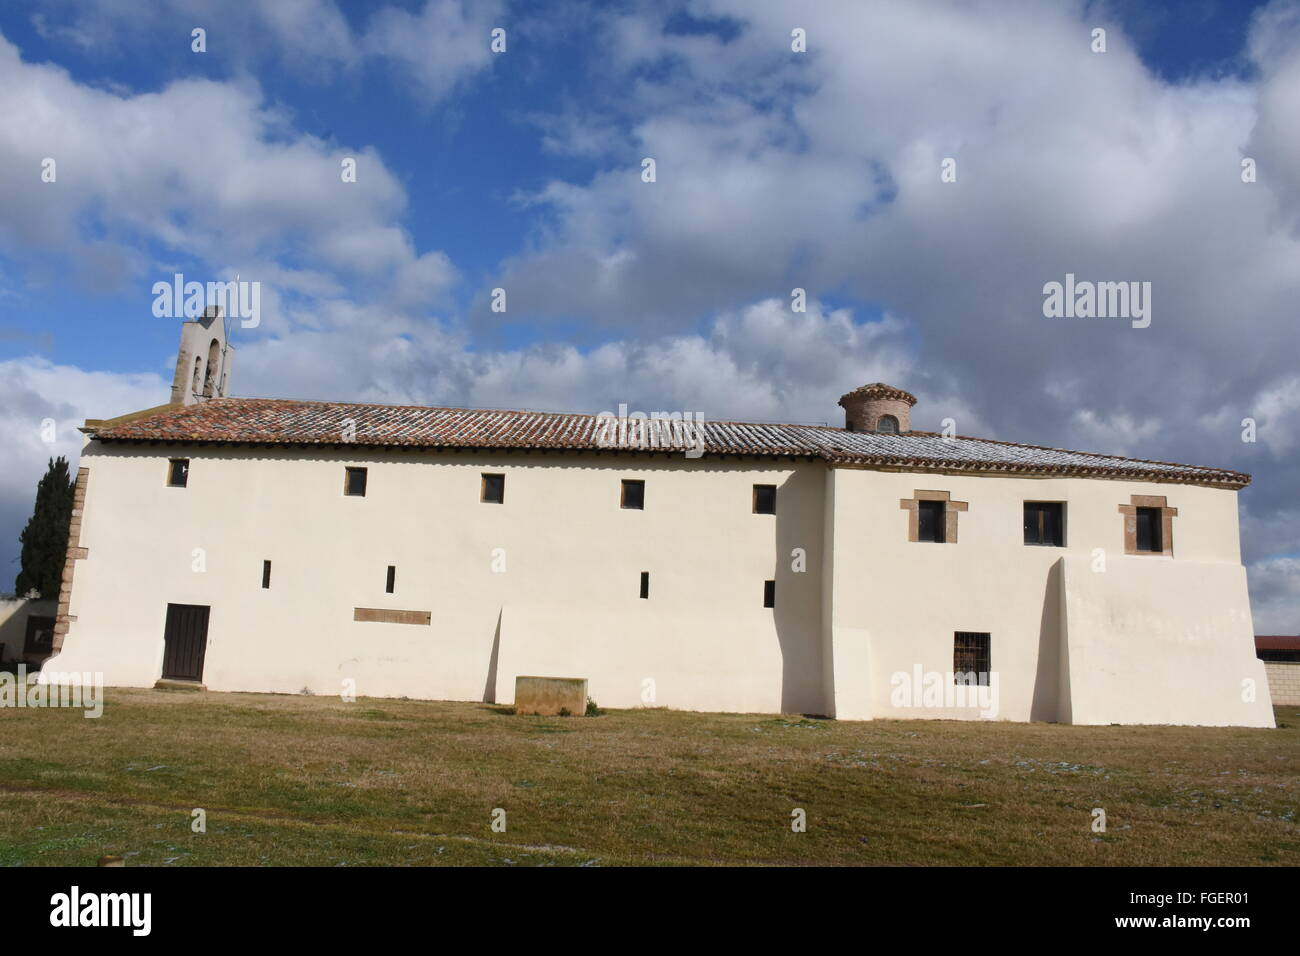 Tricio church La Rioja Spain - Stock Image